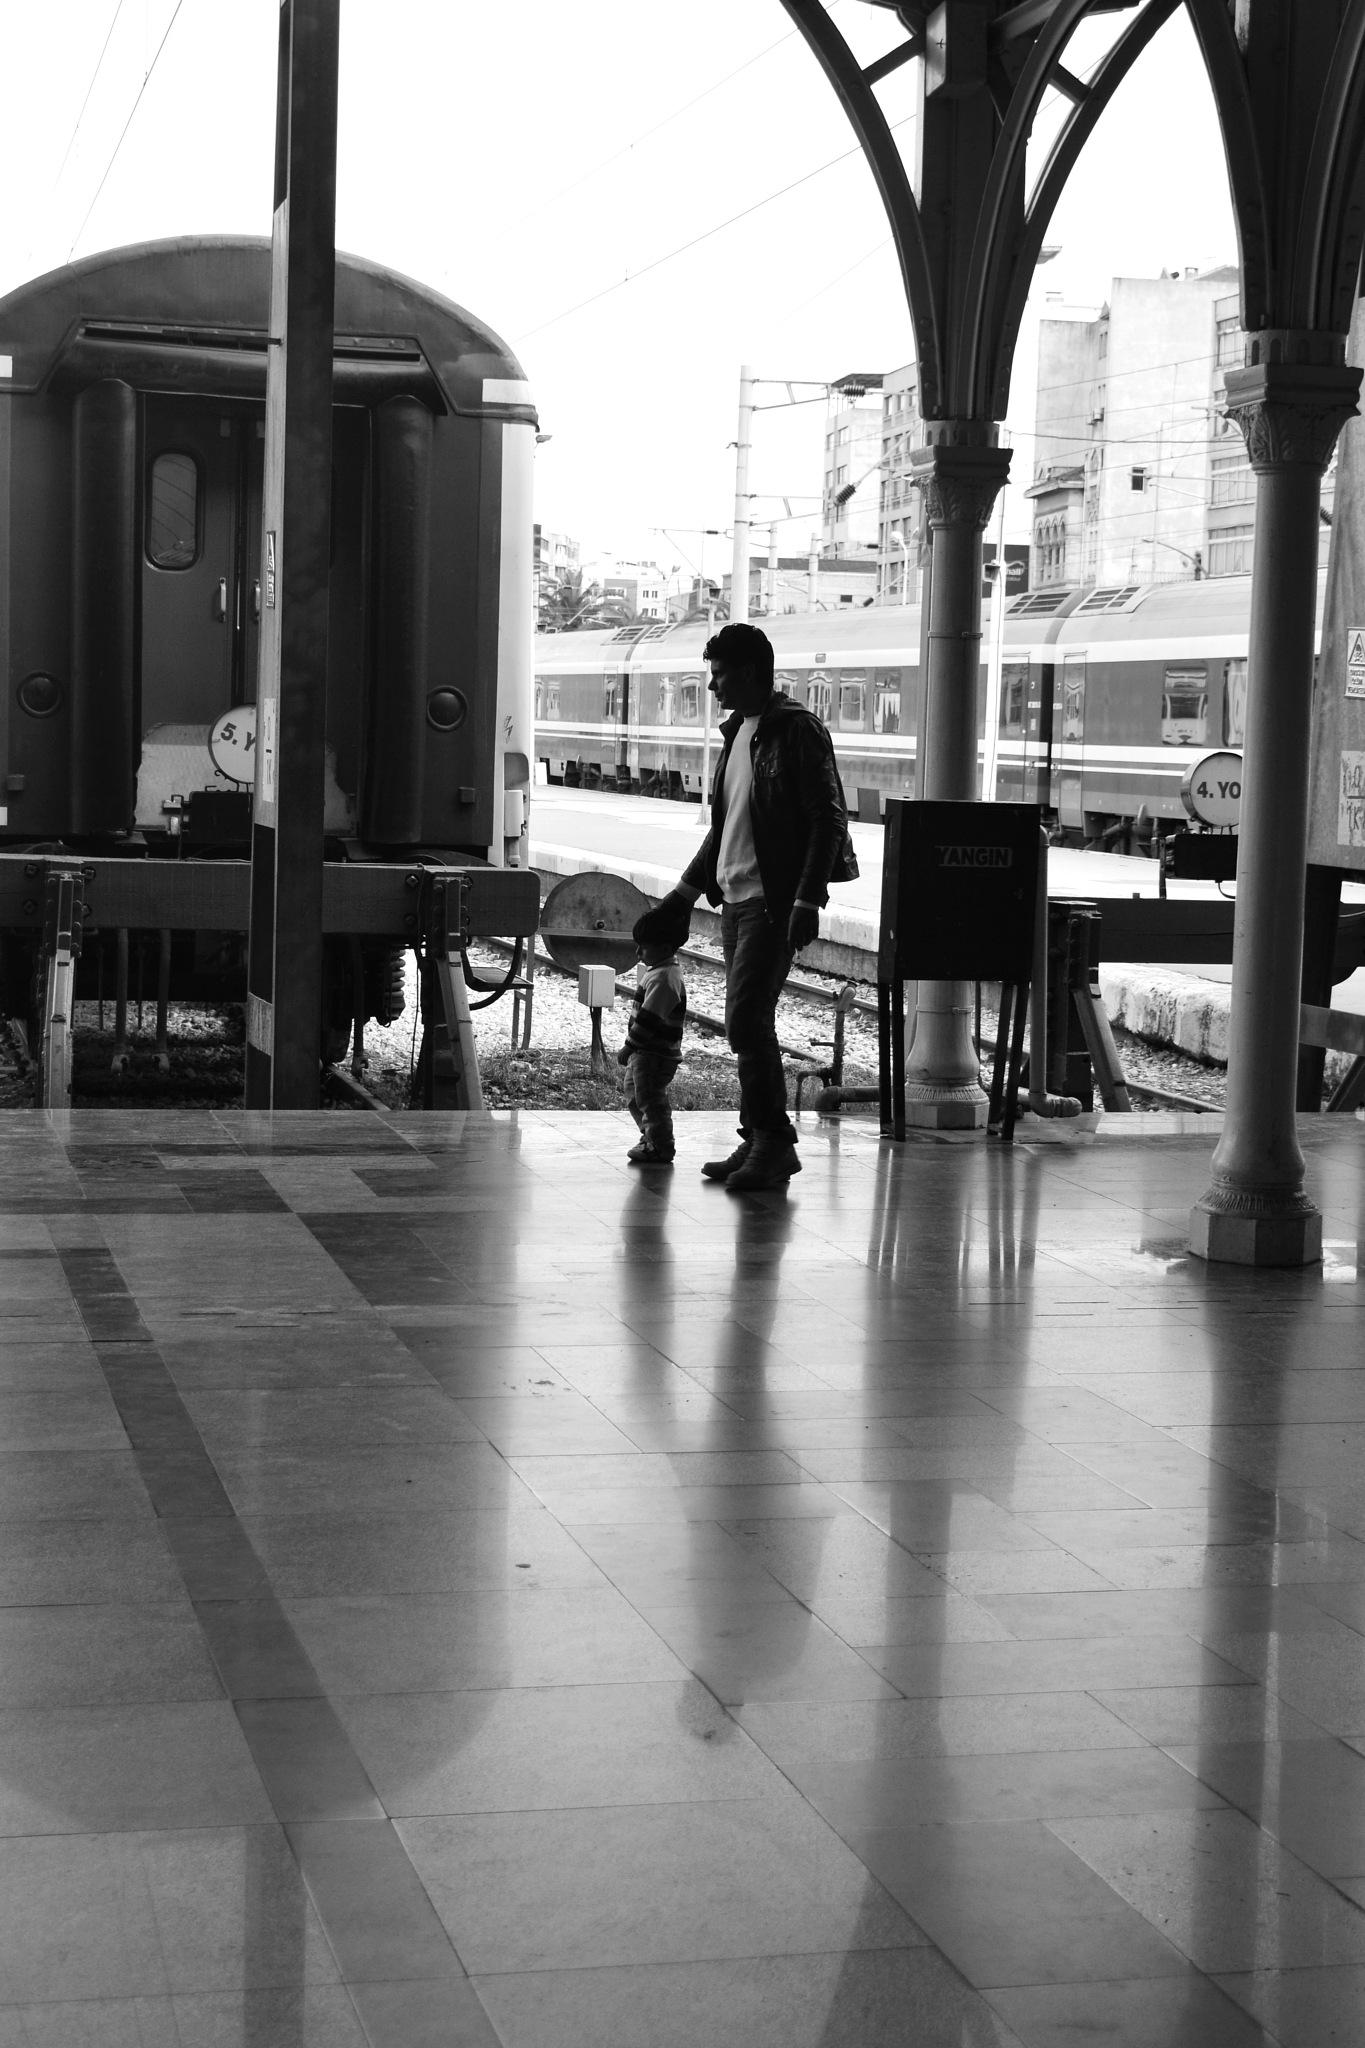 #Basmane train station . by özlem sülo